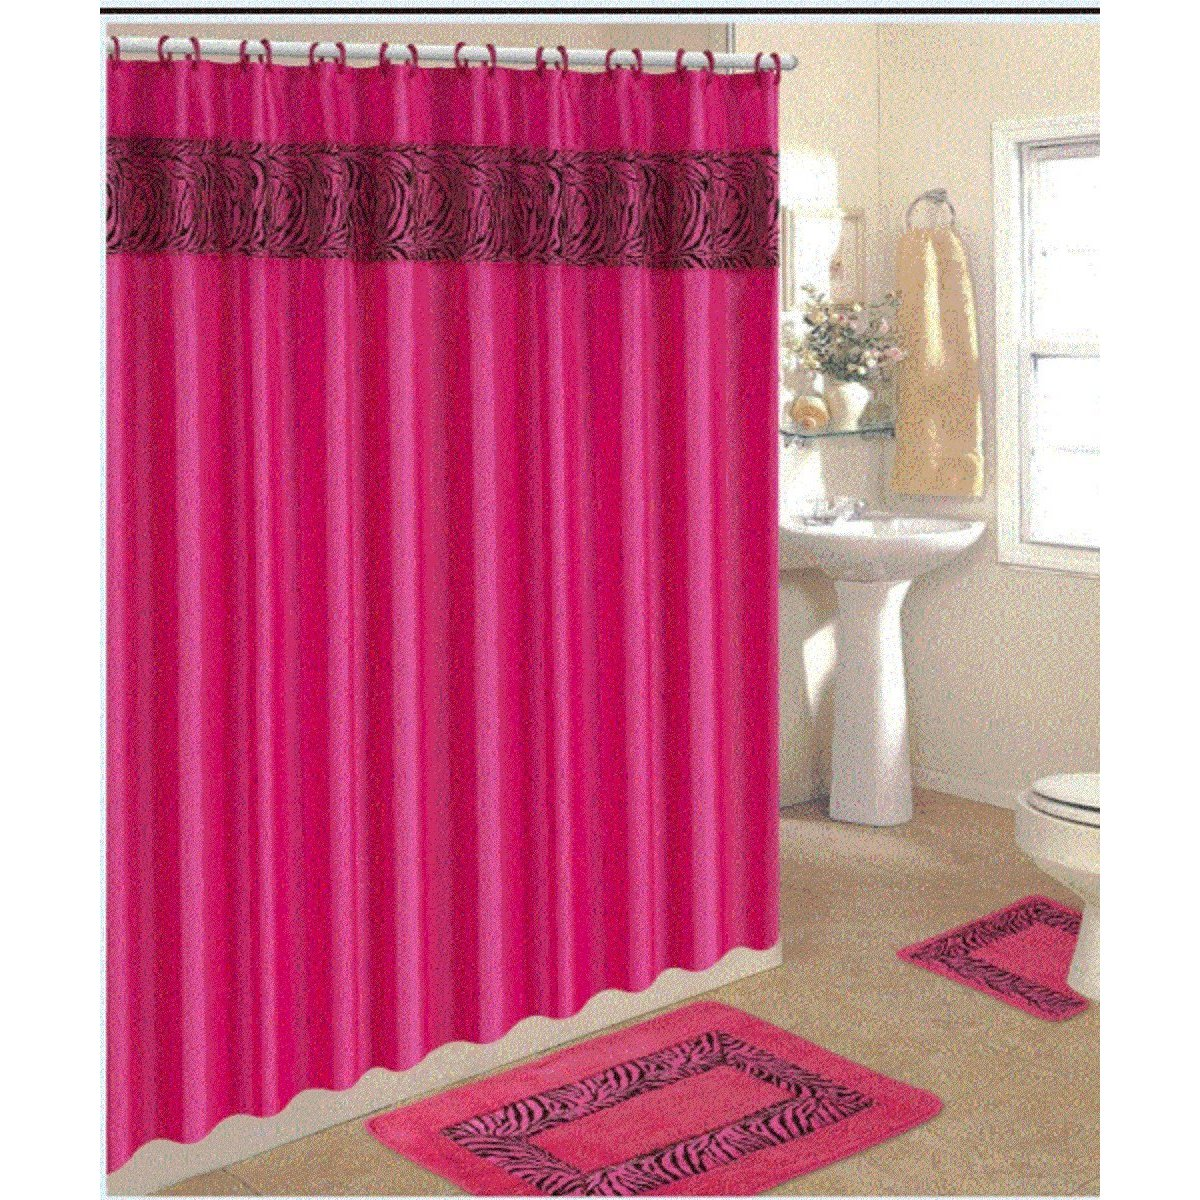 Hot pink shower curtain  Furniture Ideas  DeltaAngelGroup